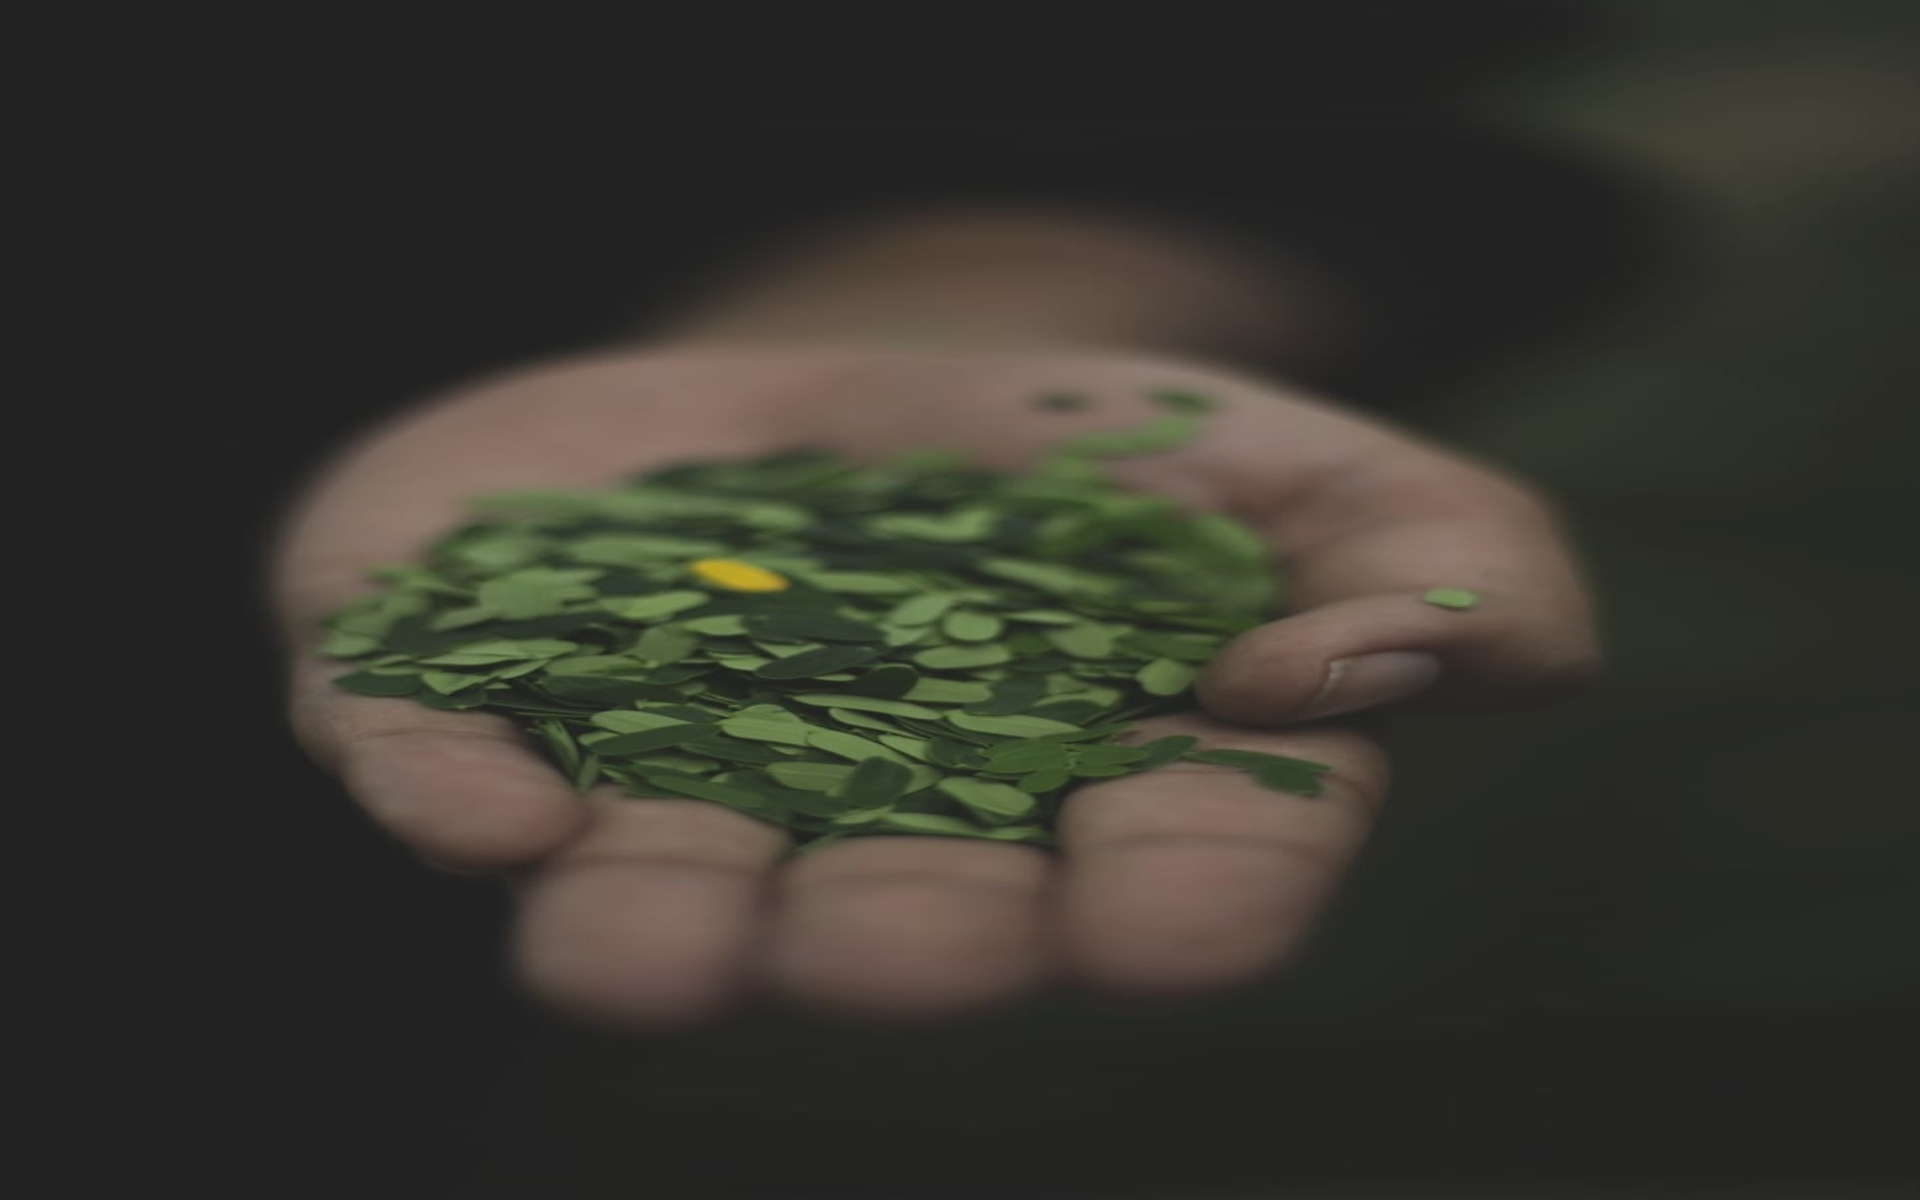 oringa Health Benefits - Amazing Benefits of Moringa for Your Health